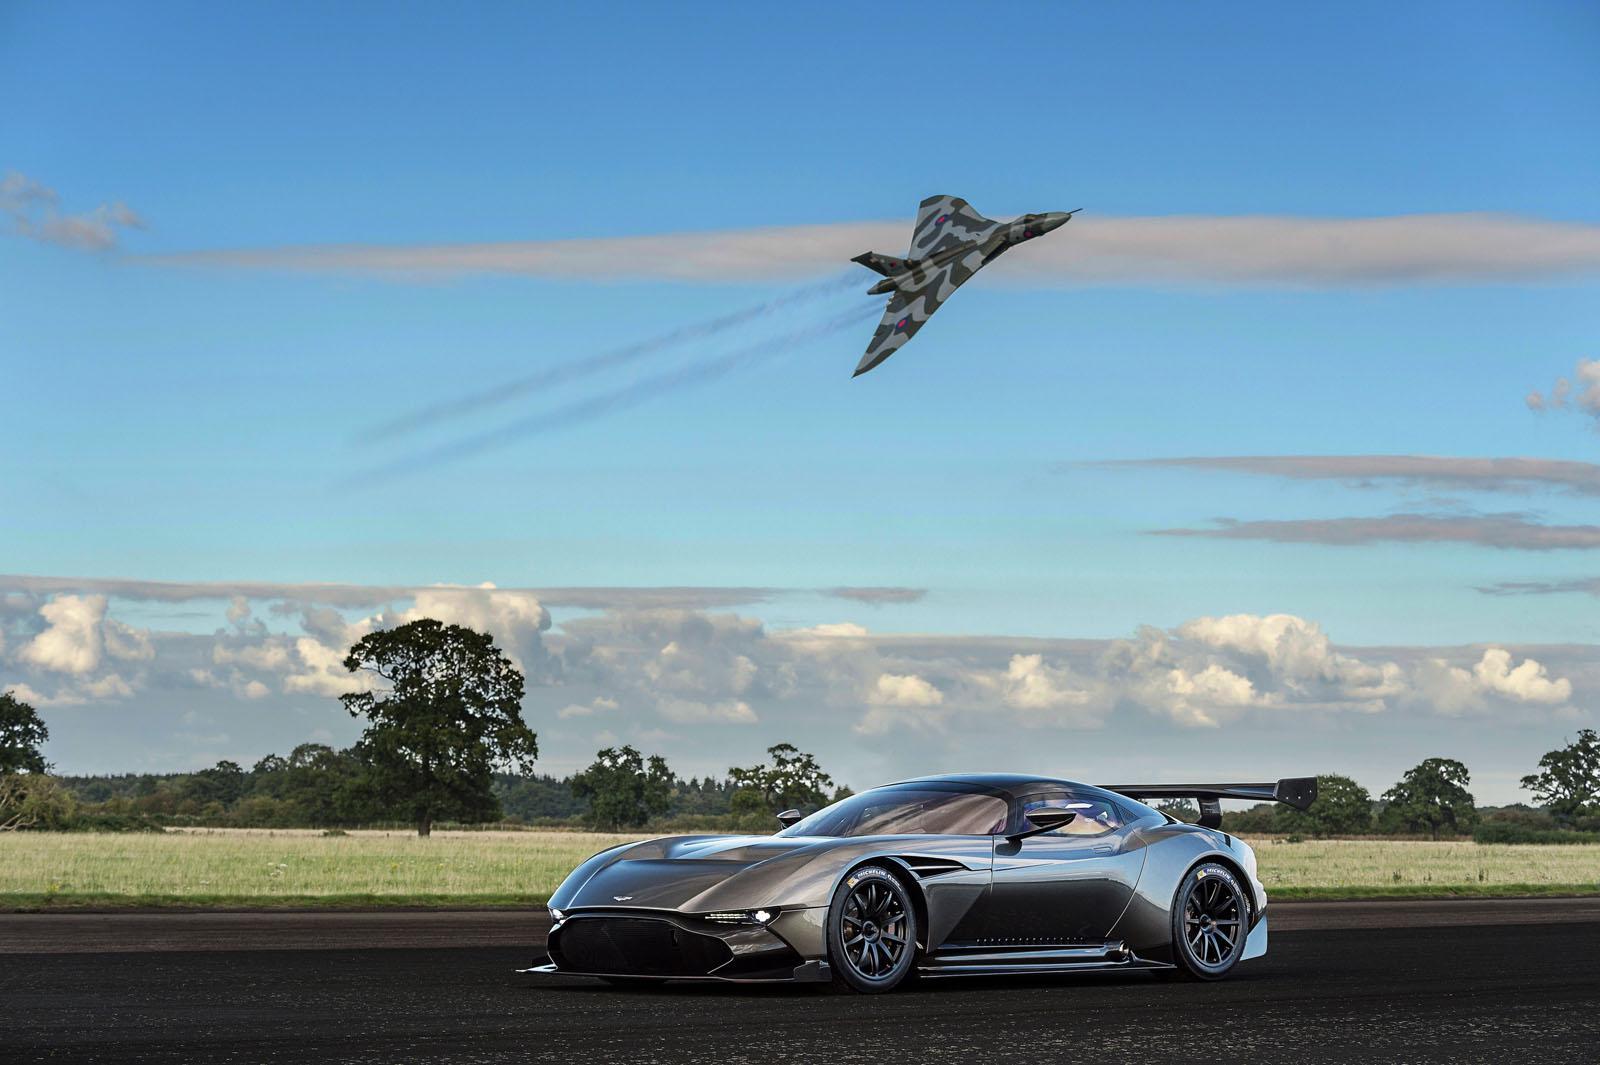 Aston-Martin-Vulcan-Avro-2